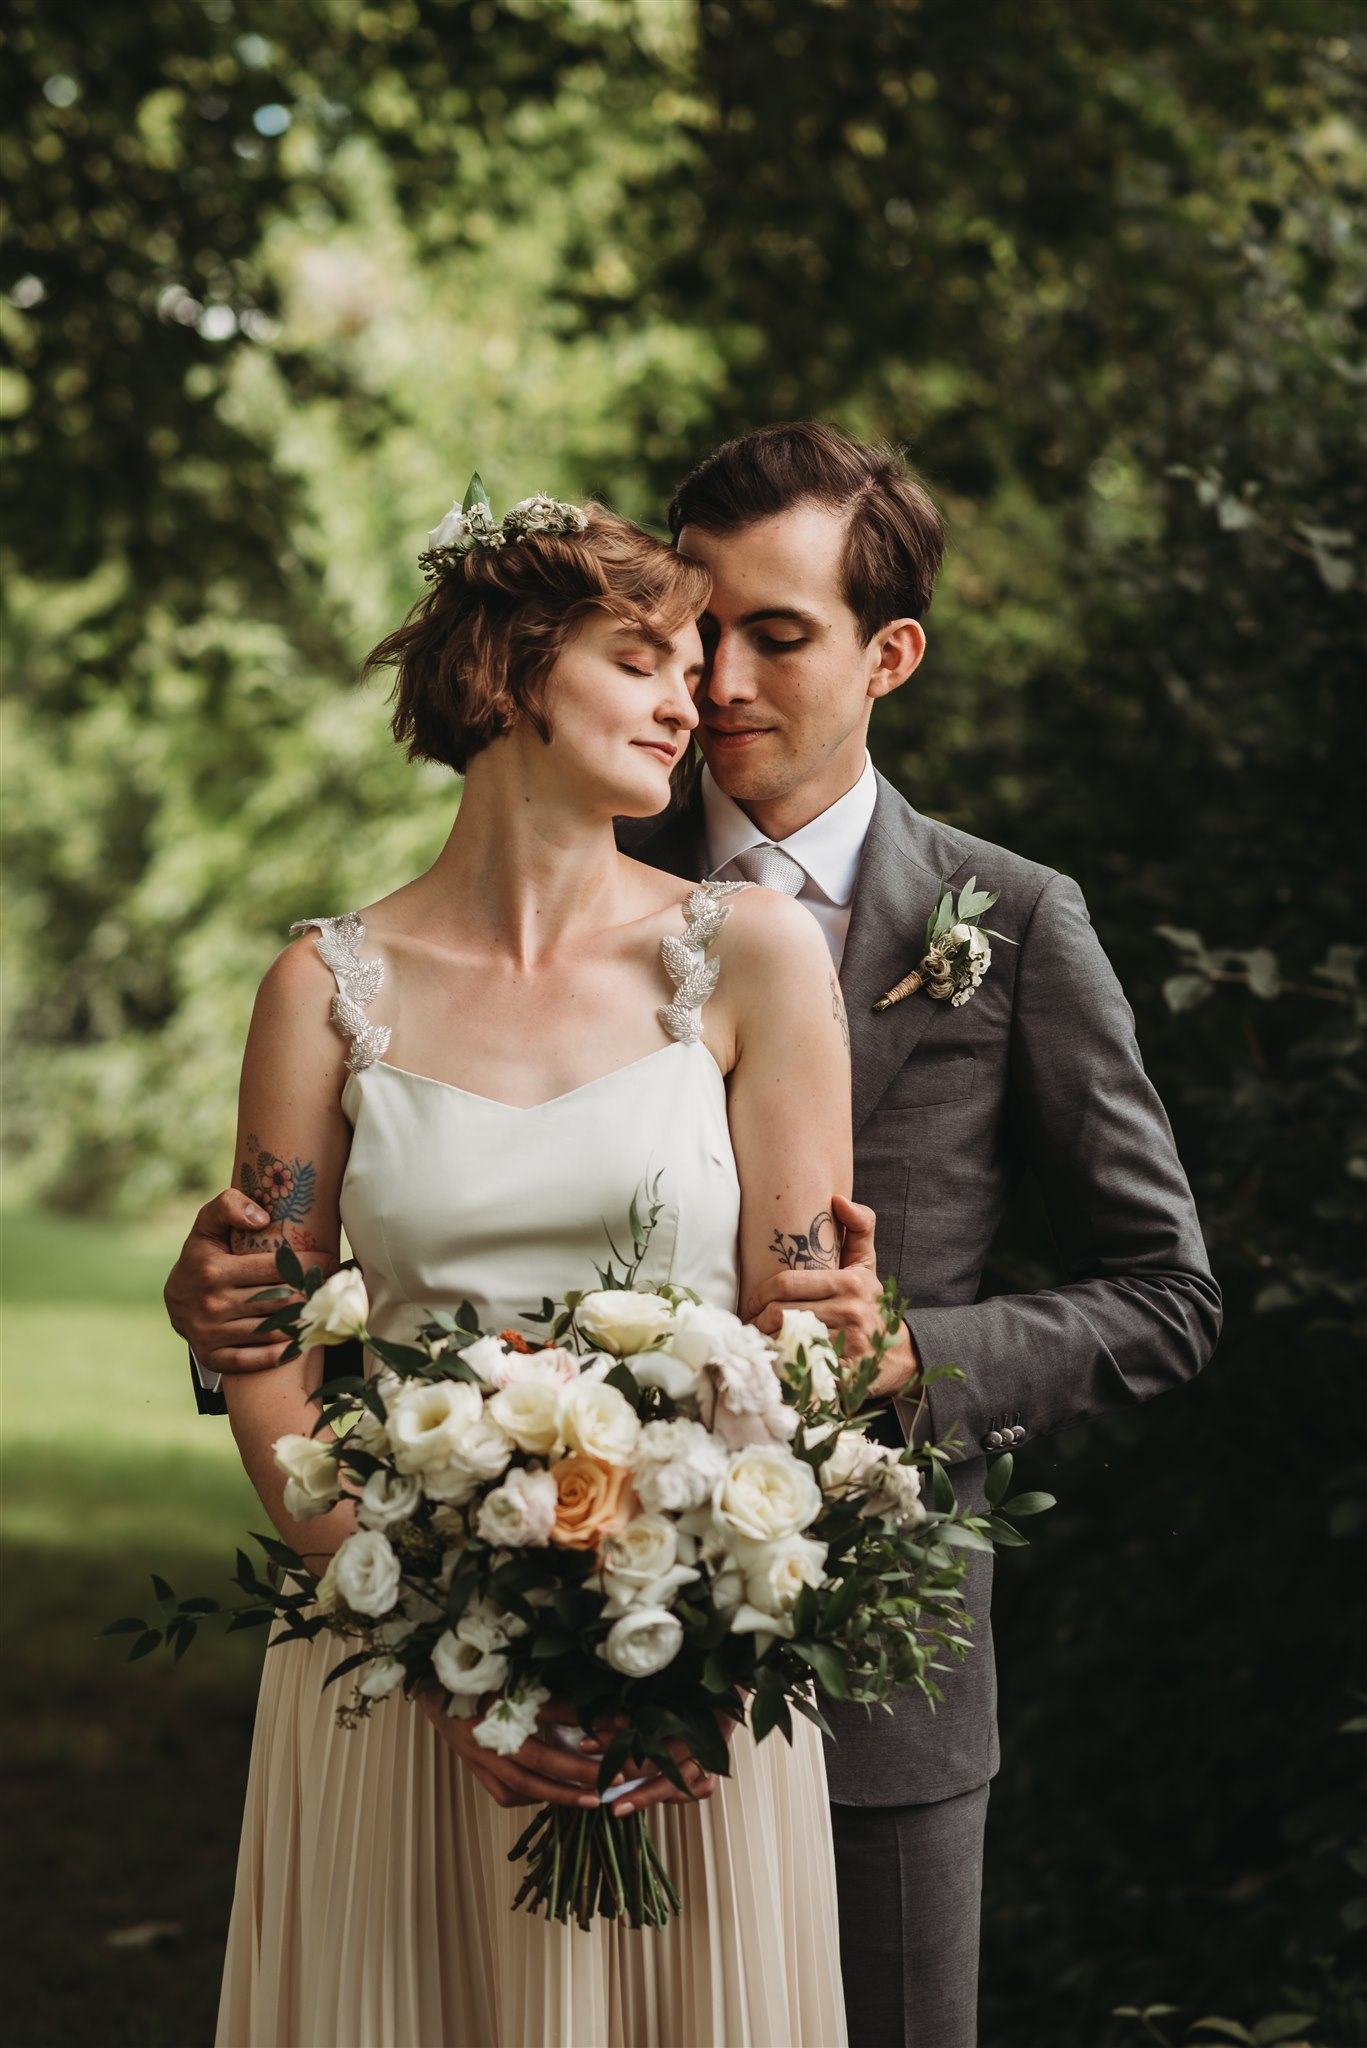 fanshawe conservation area wedding photos 334 1 - Watson Porter Pavillion Wedding